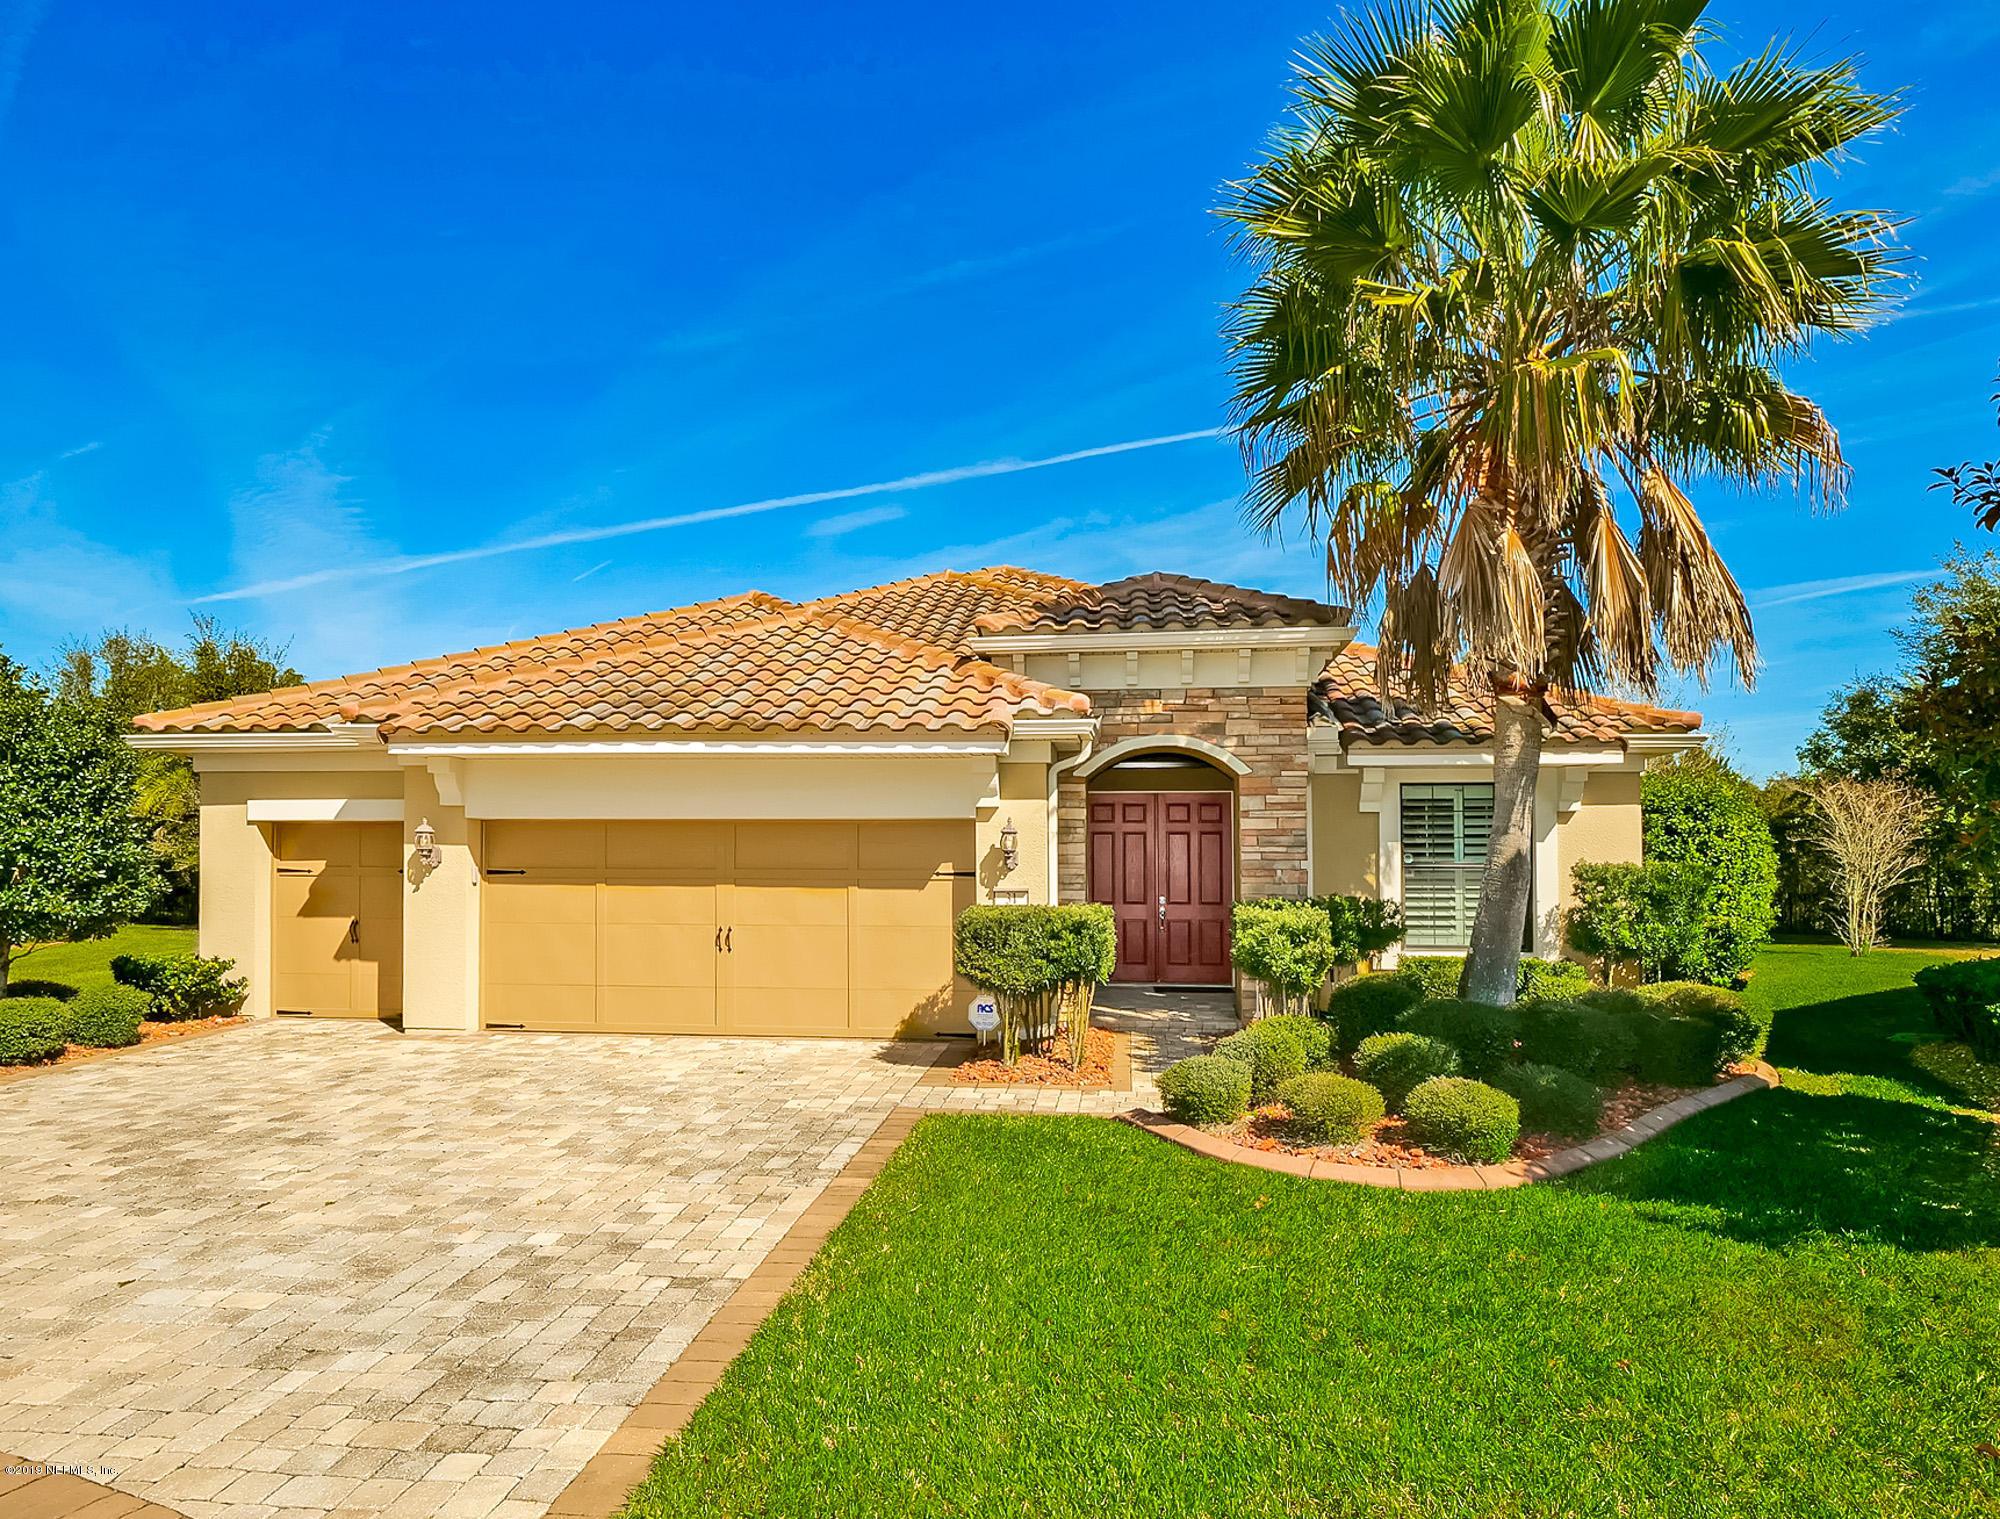 31 Garden Grove Ct Ponte Vedra Beach, FL 32081